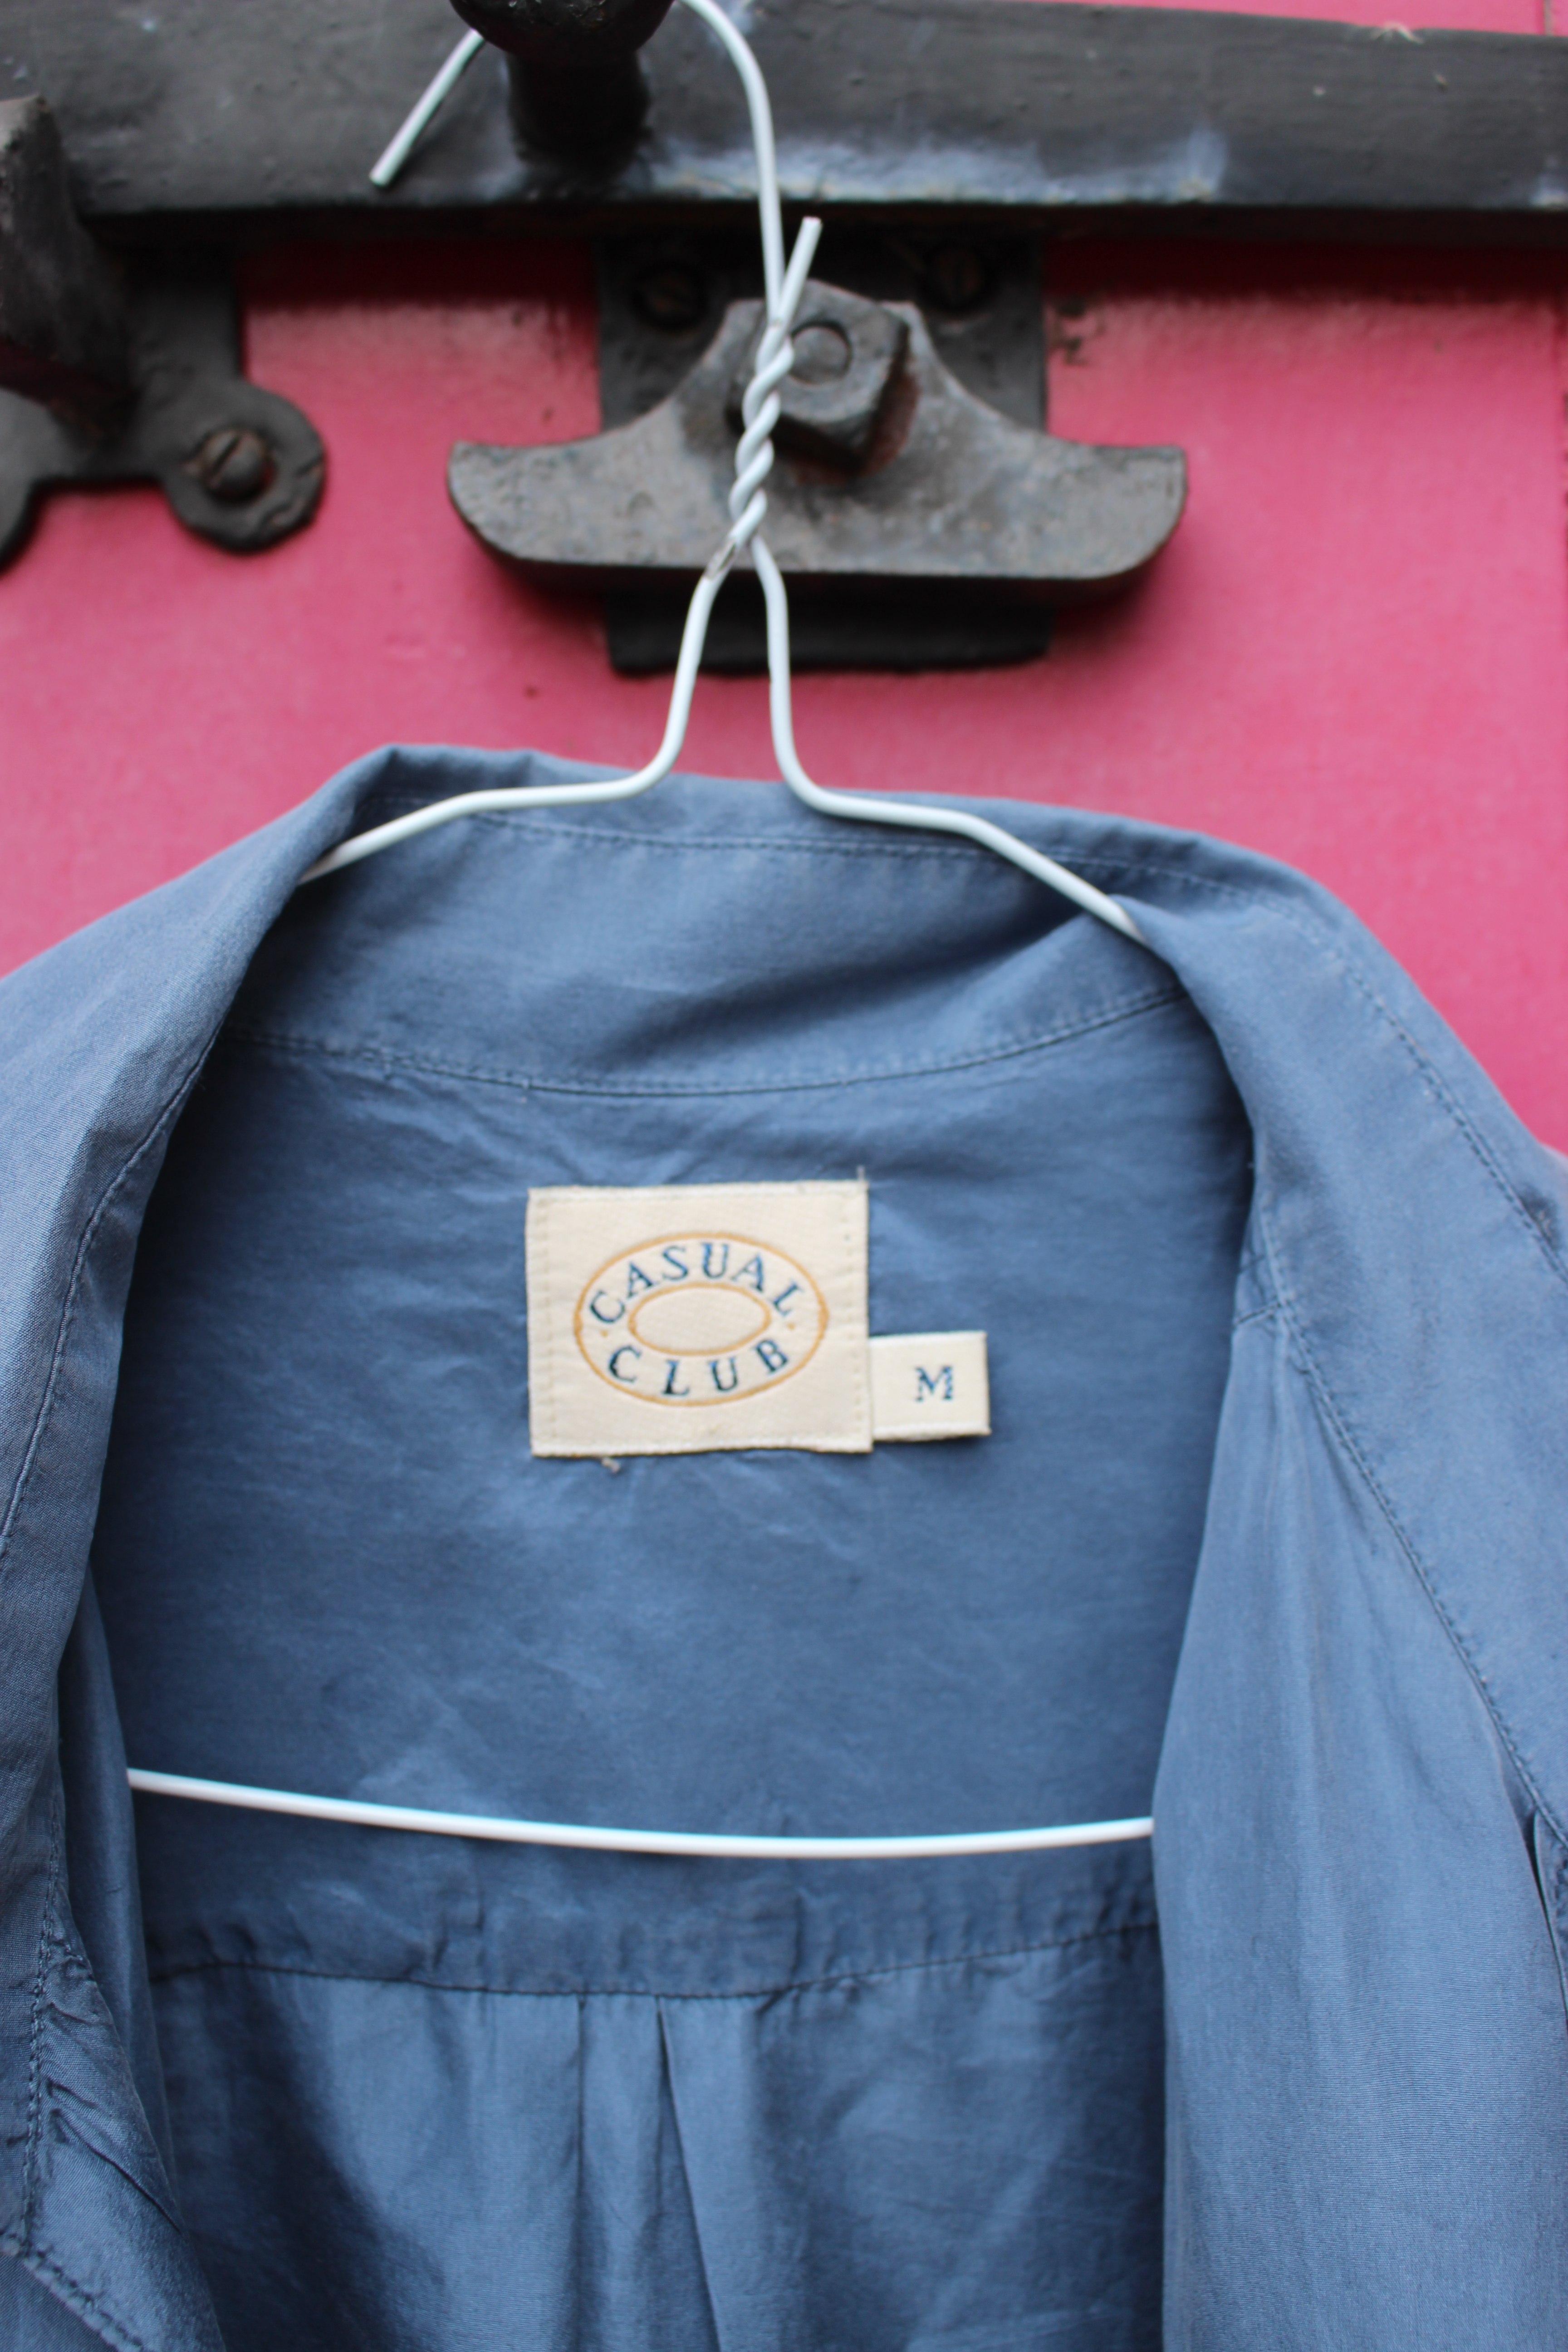 Casual Club grey short-sleeved silk shirt, from Unicorn, 5 Ship Street, Oxford